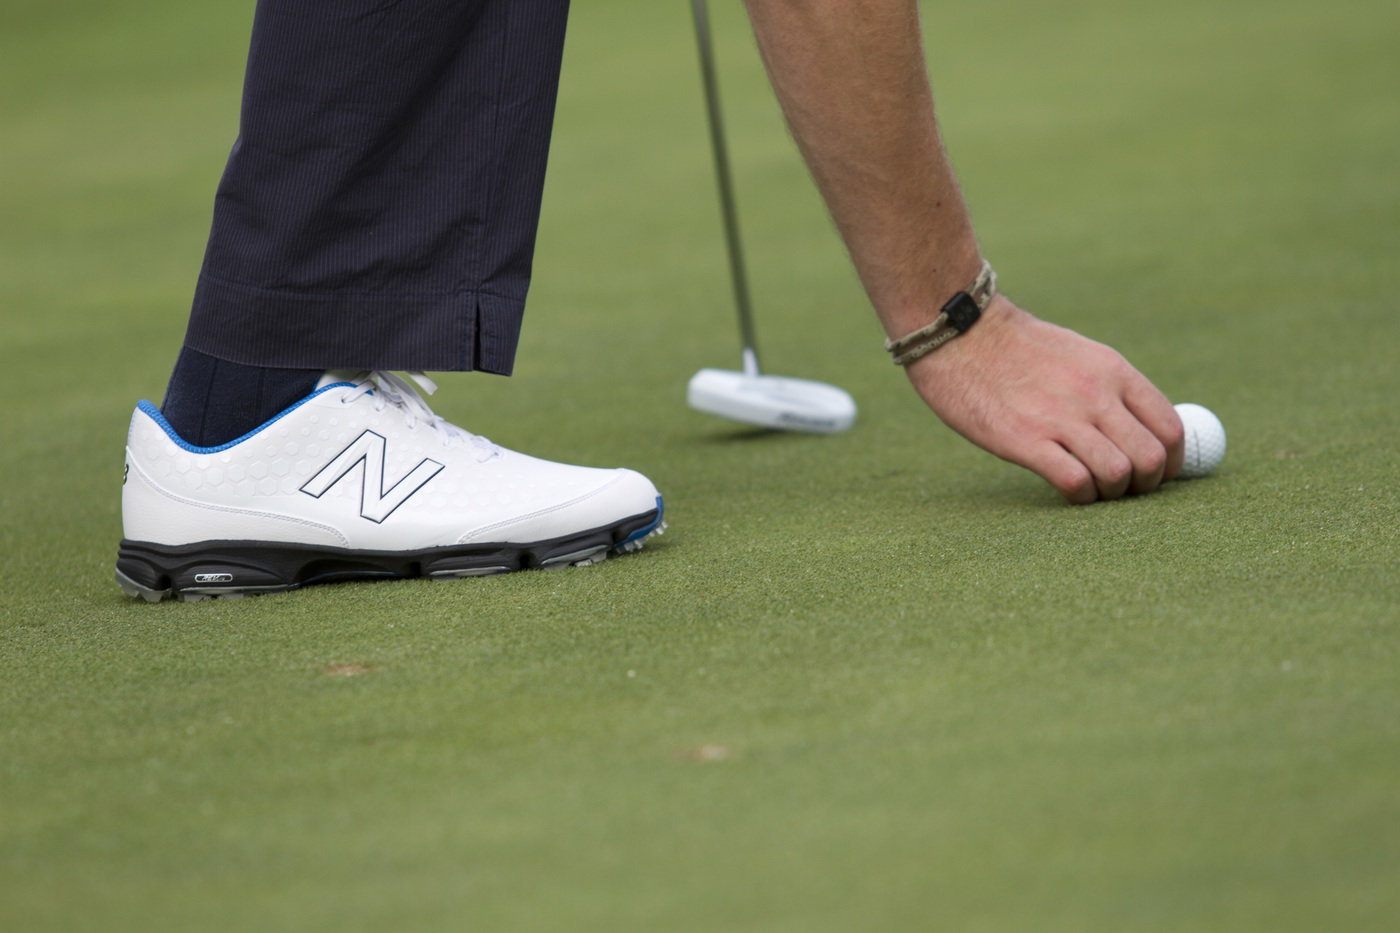 new balance golf 2002